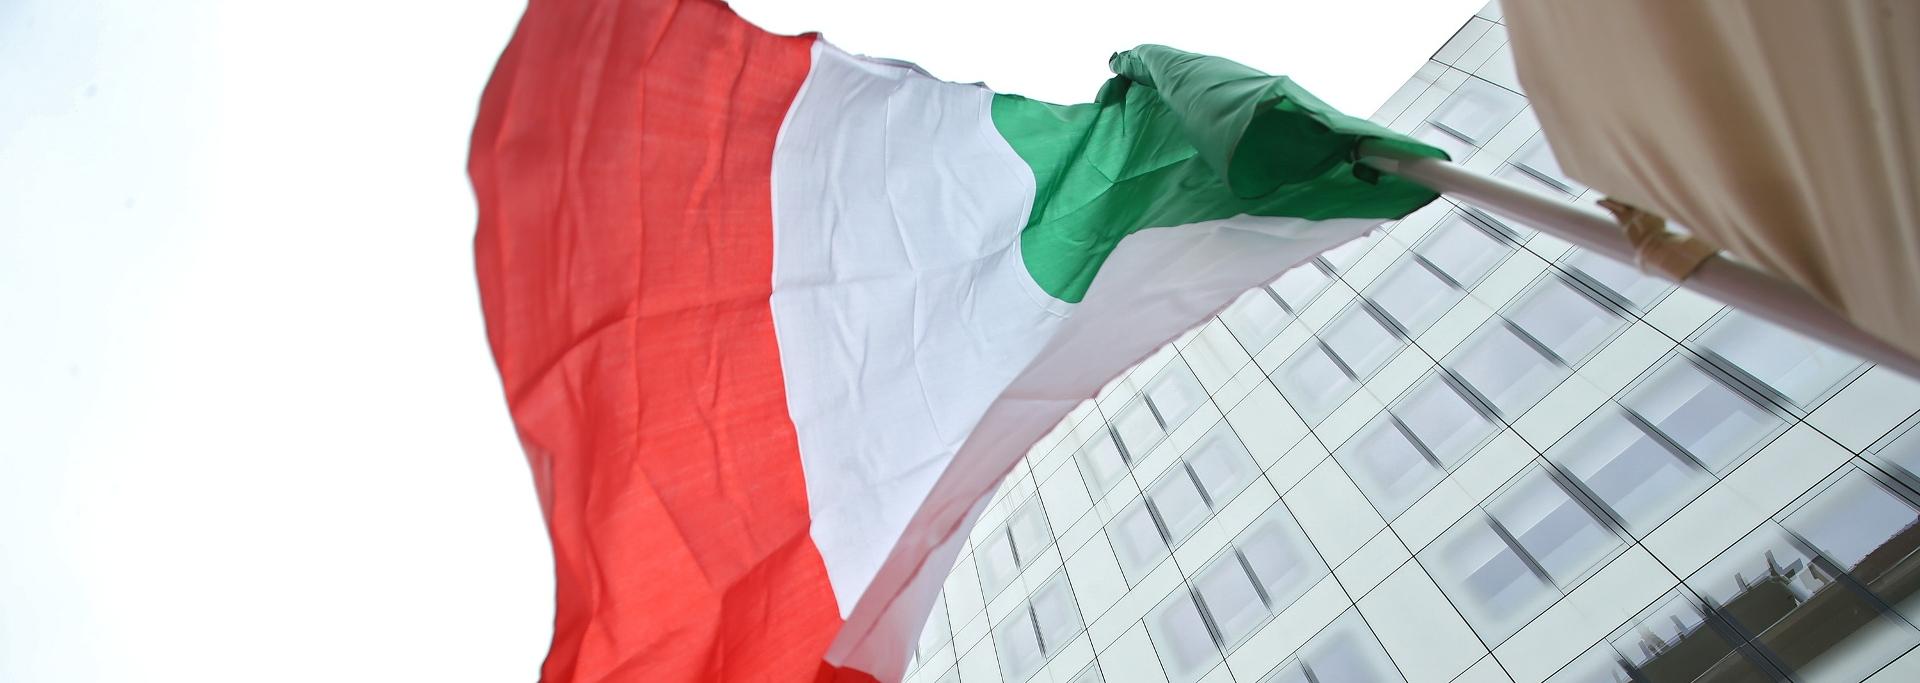 SLIČAN SCENARIJ Italija bi mogla postati nova Grčka